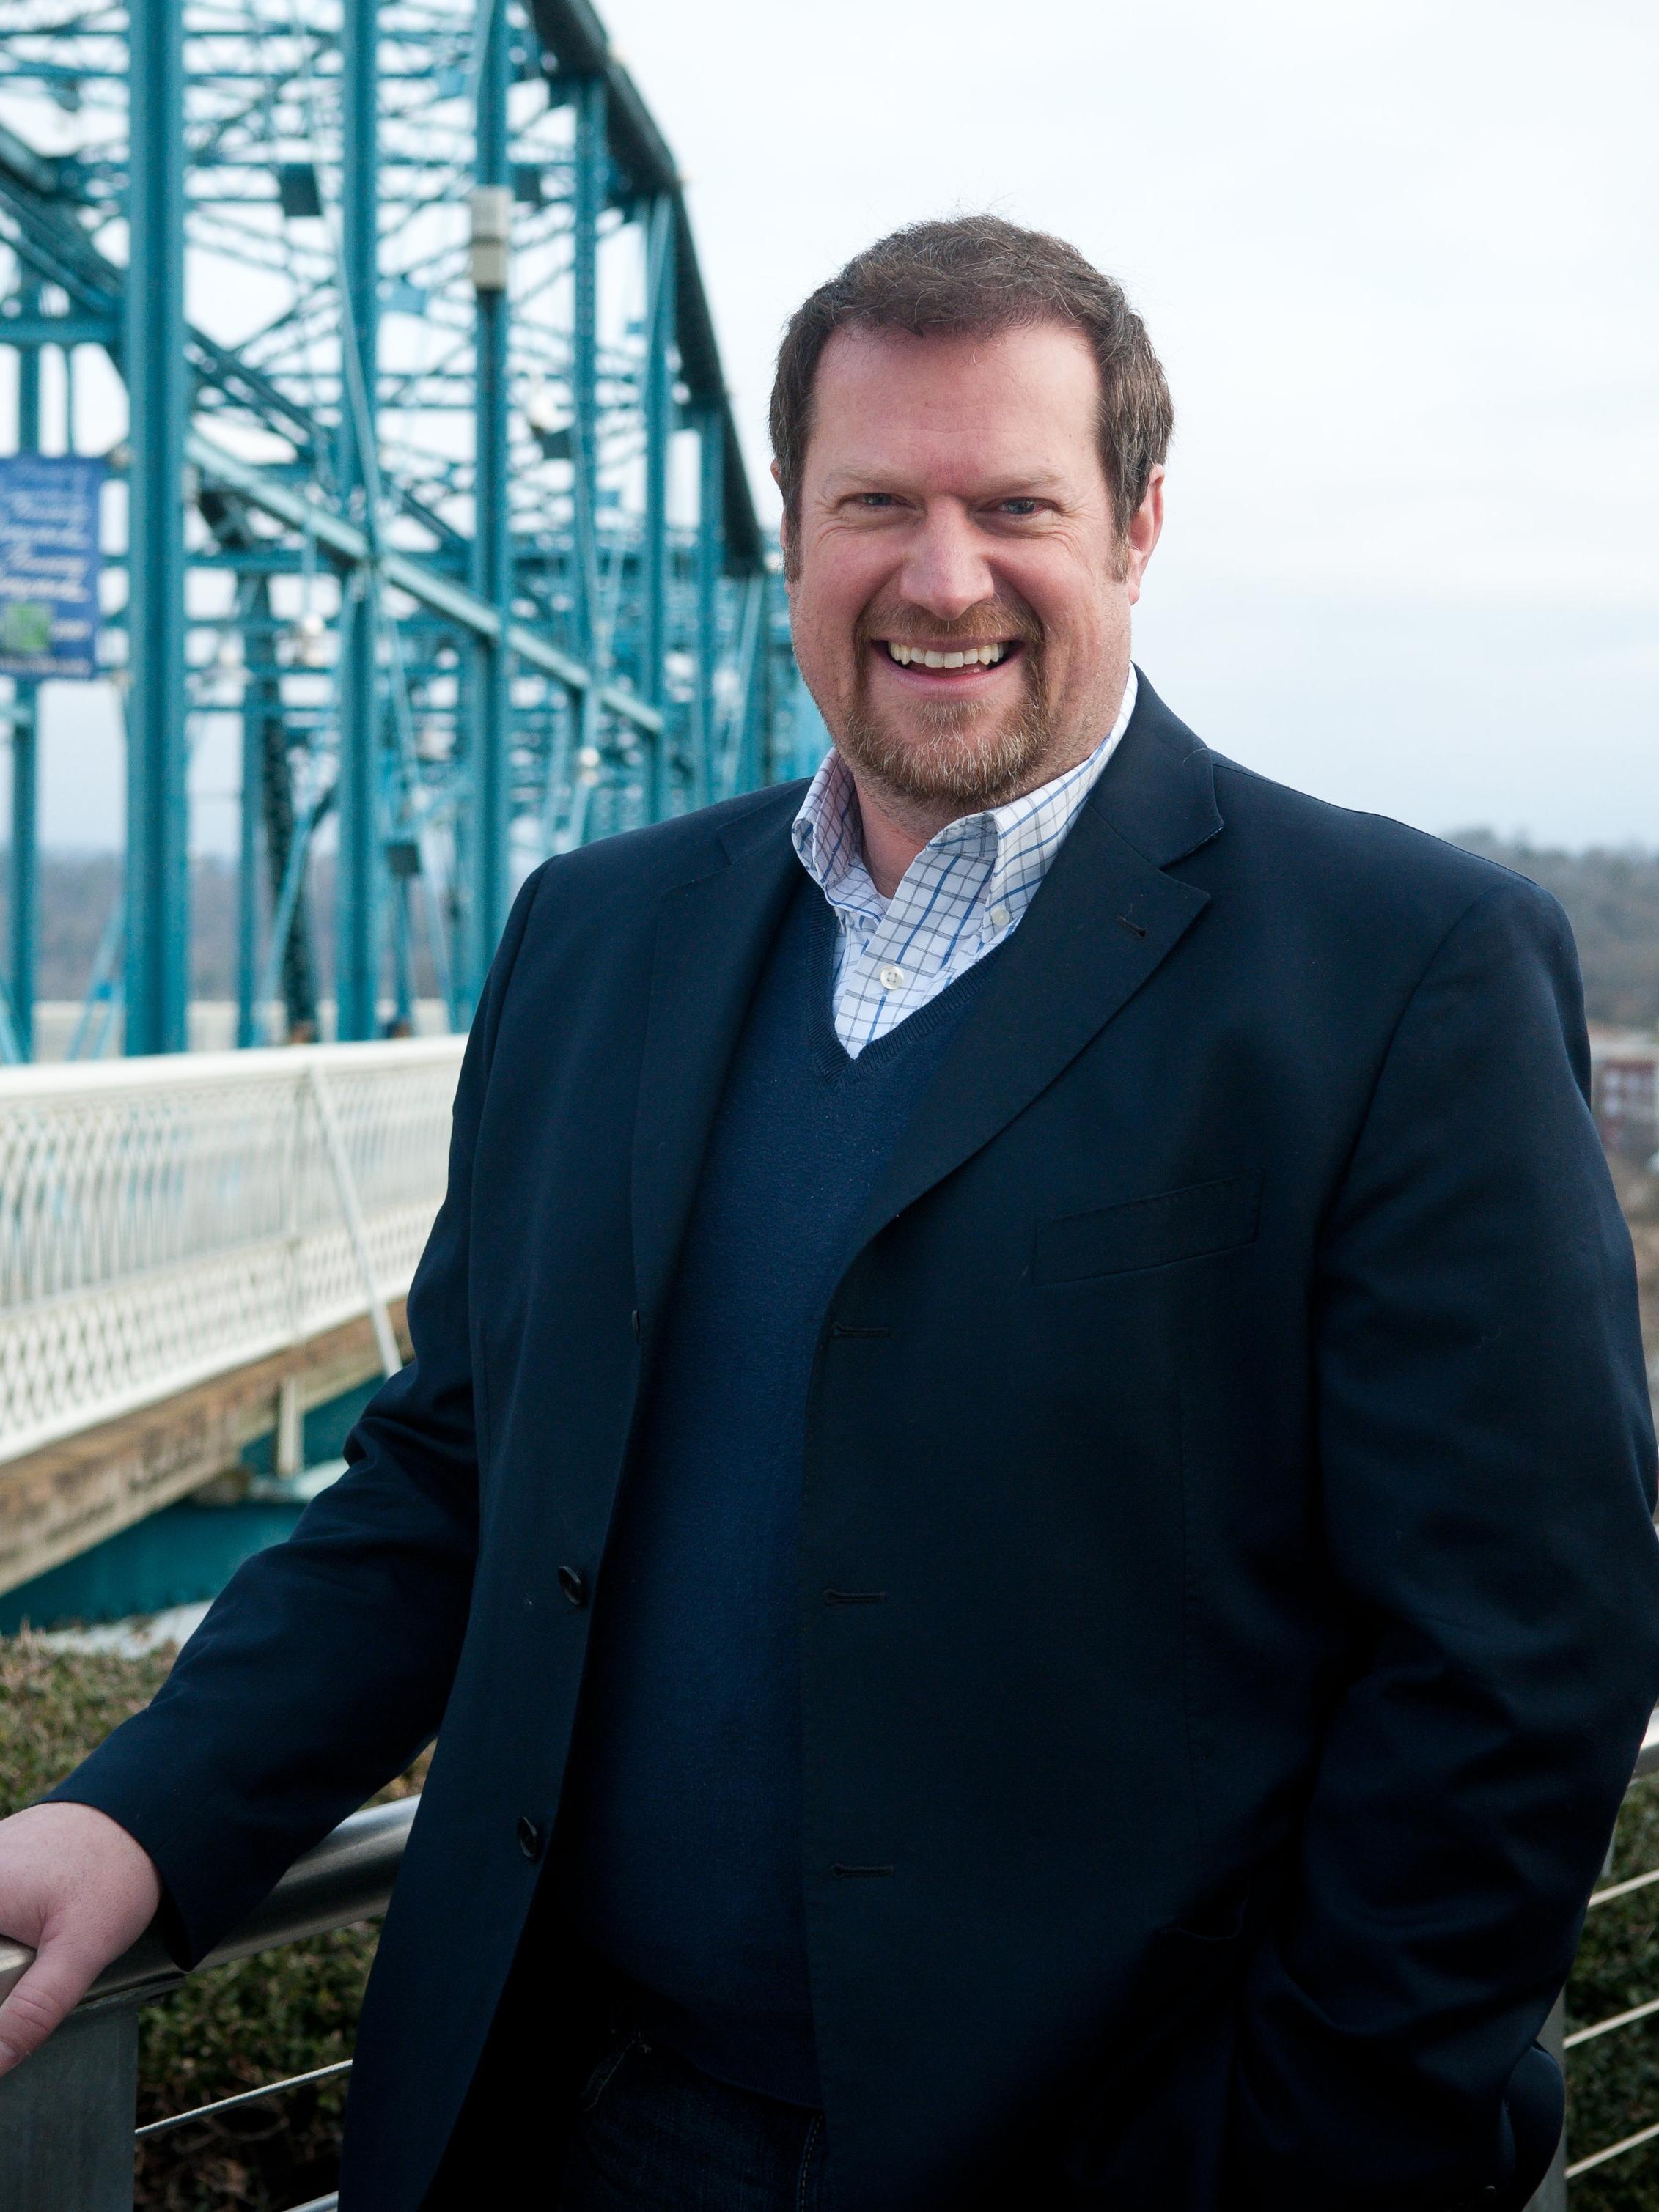 Bradley Gray - Worship Leader